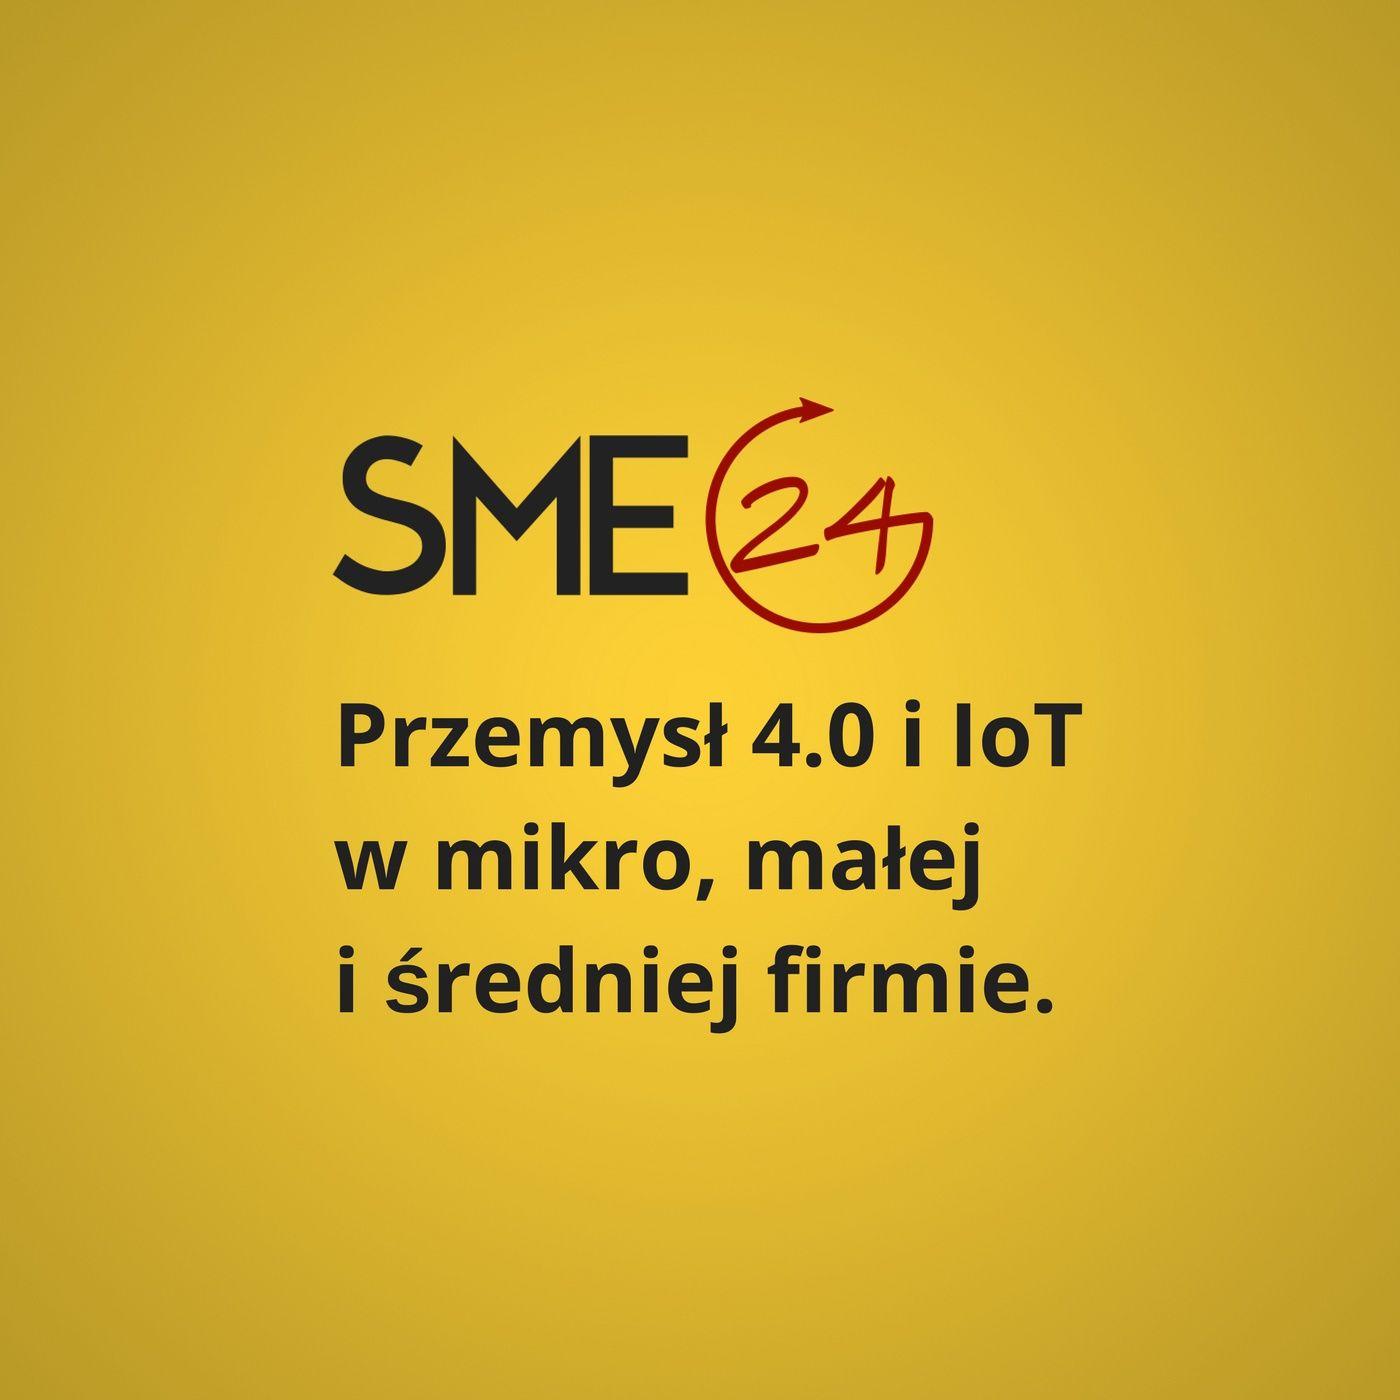 SME24pl